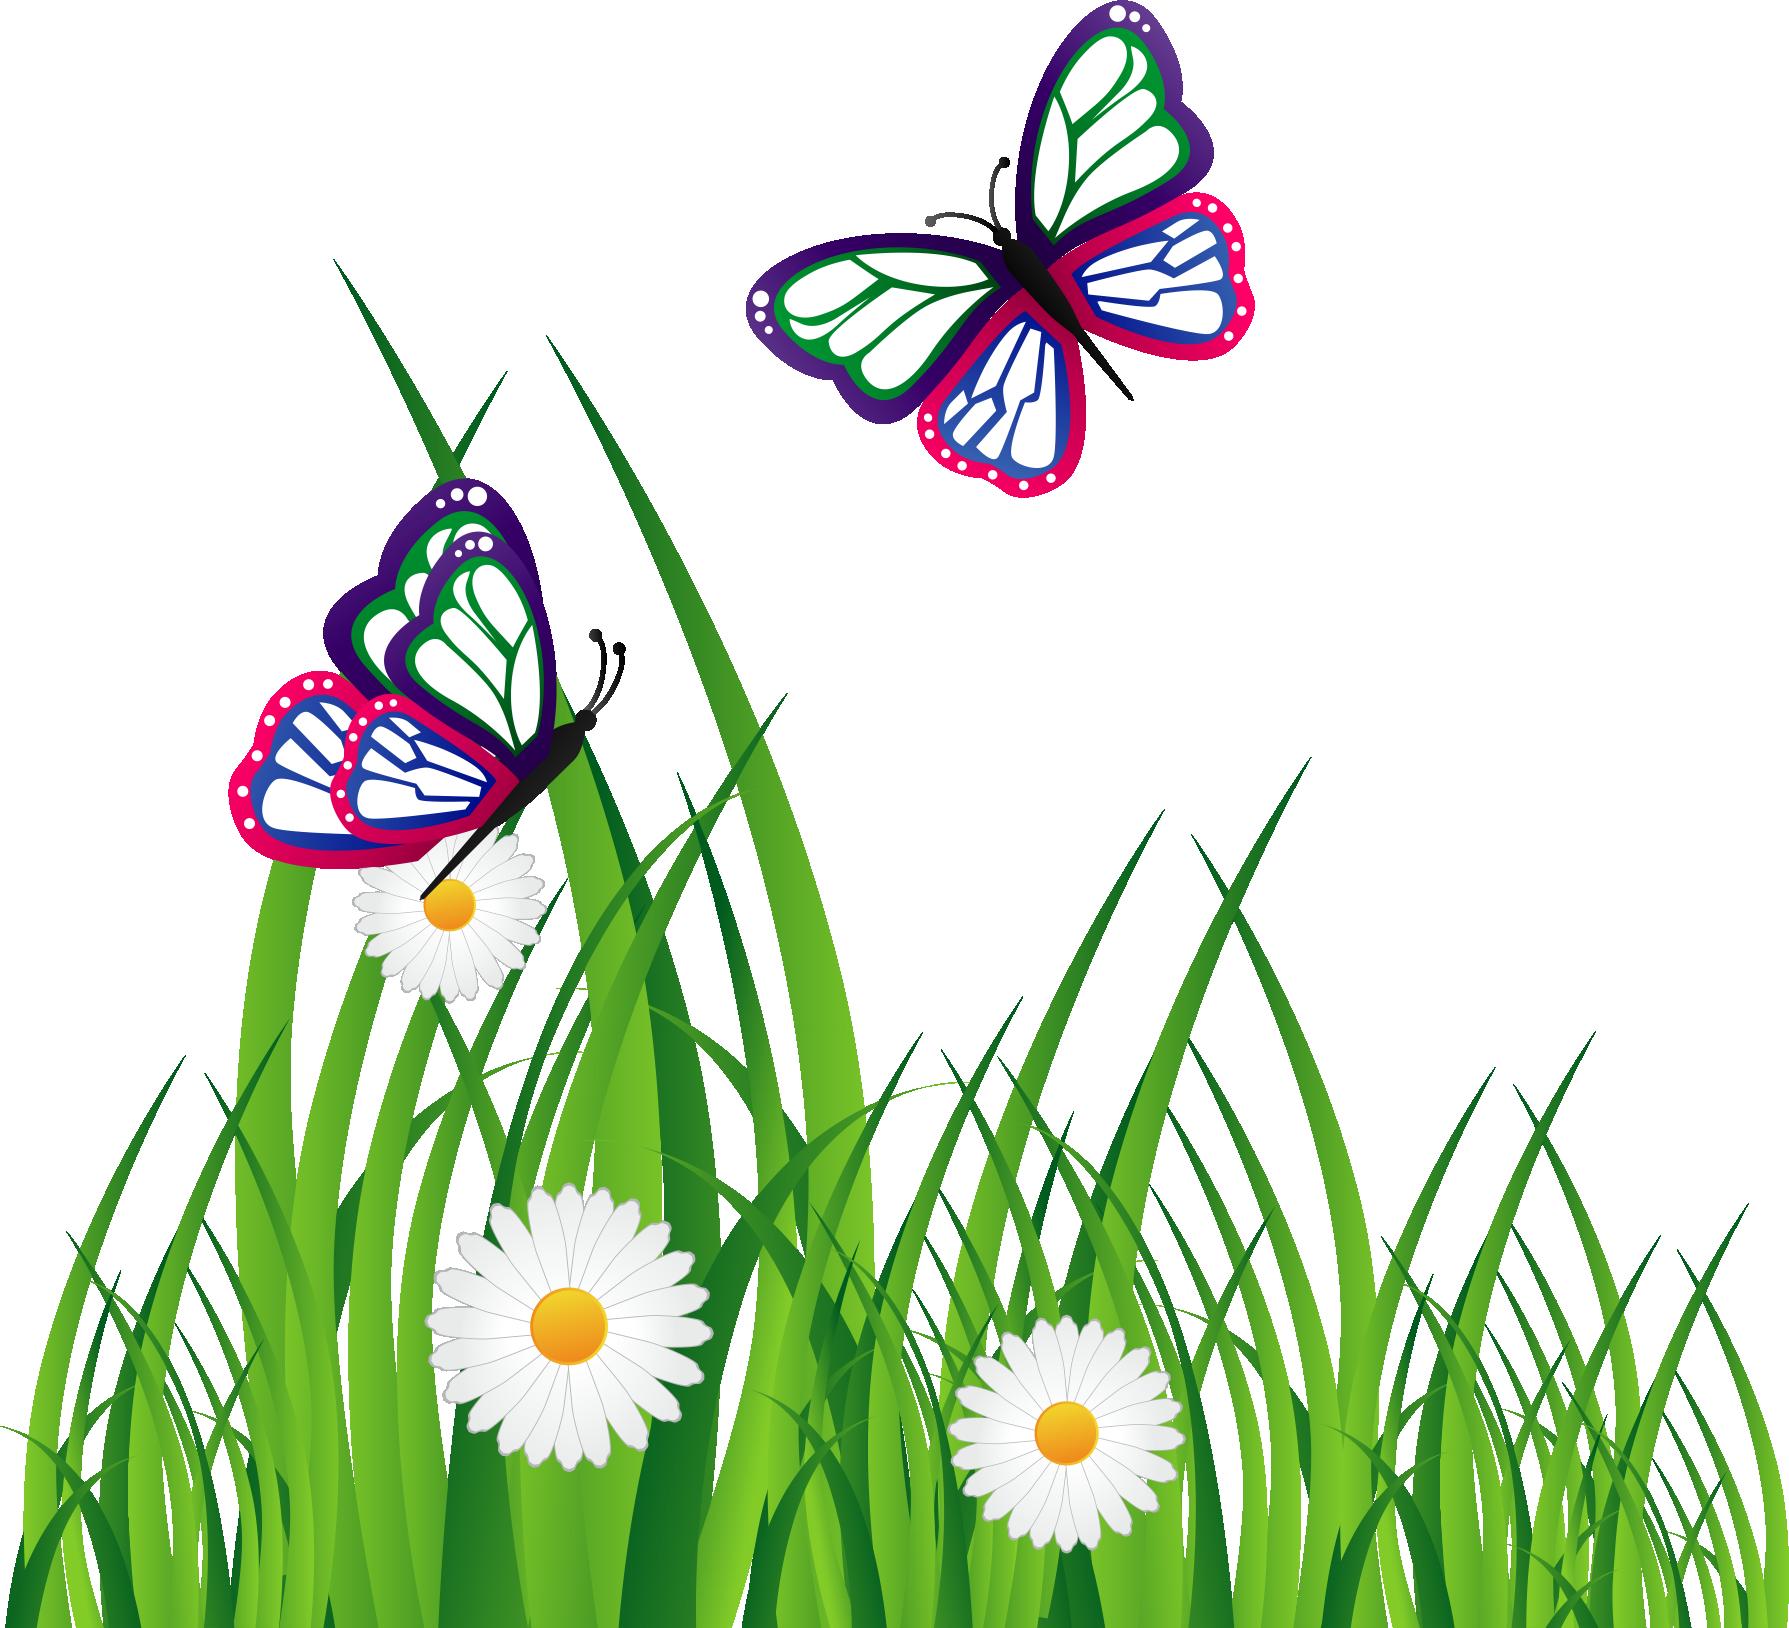 Clipart grass butterfly. Adobe illustrator graphic design